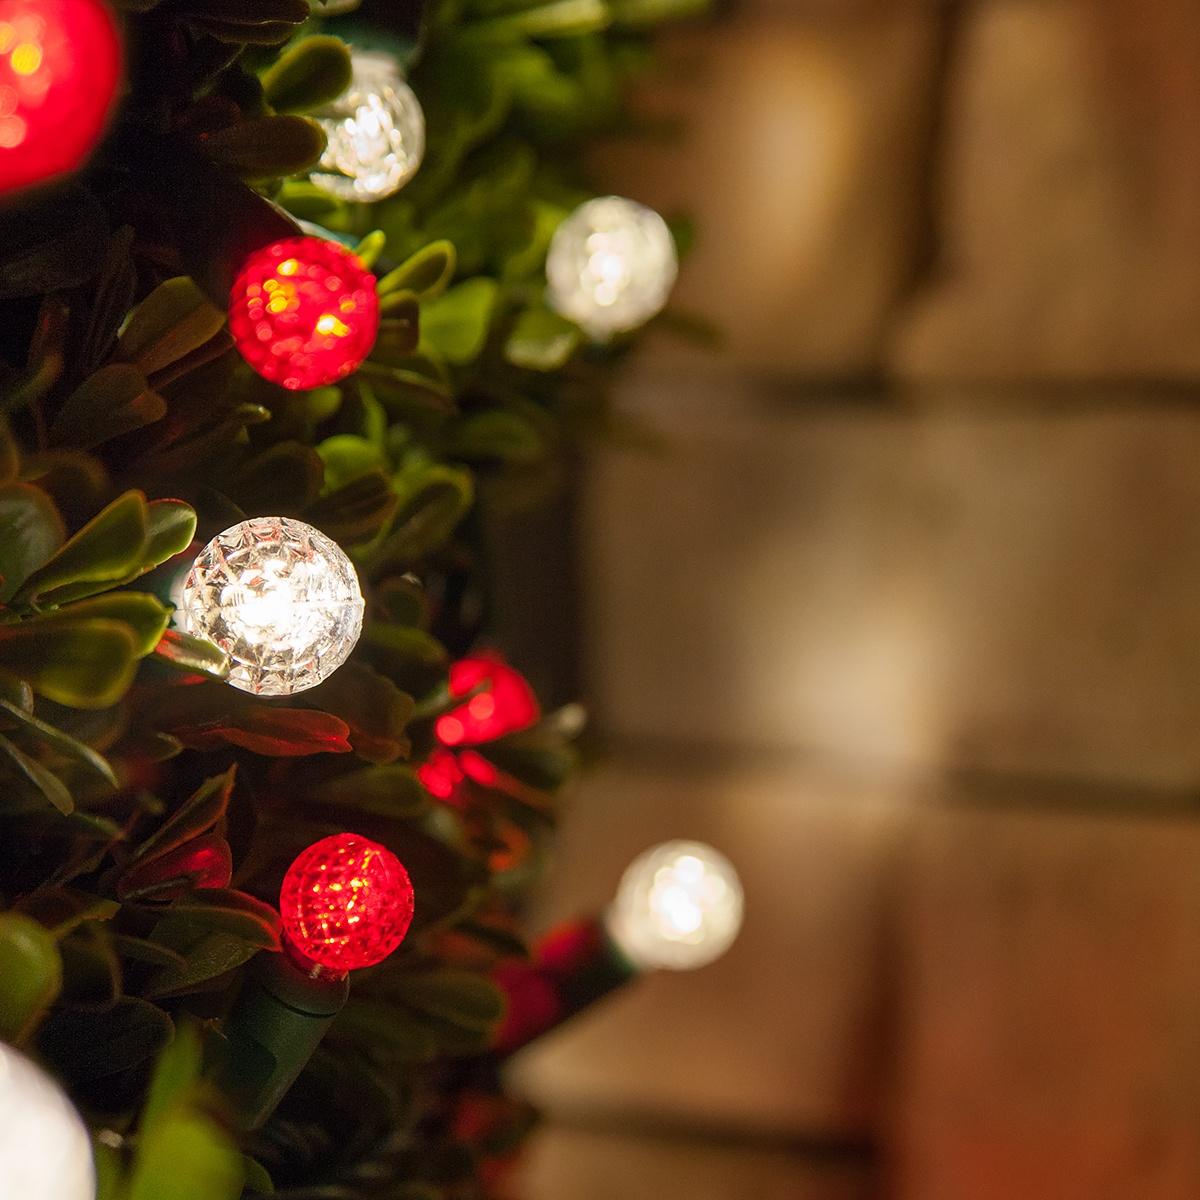 Led Christmas Lights 70 G12 Warm White String 4 Spacing